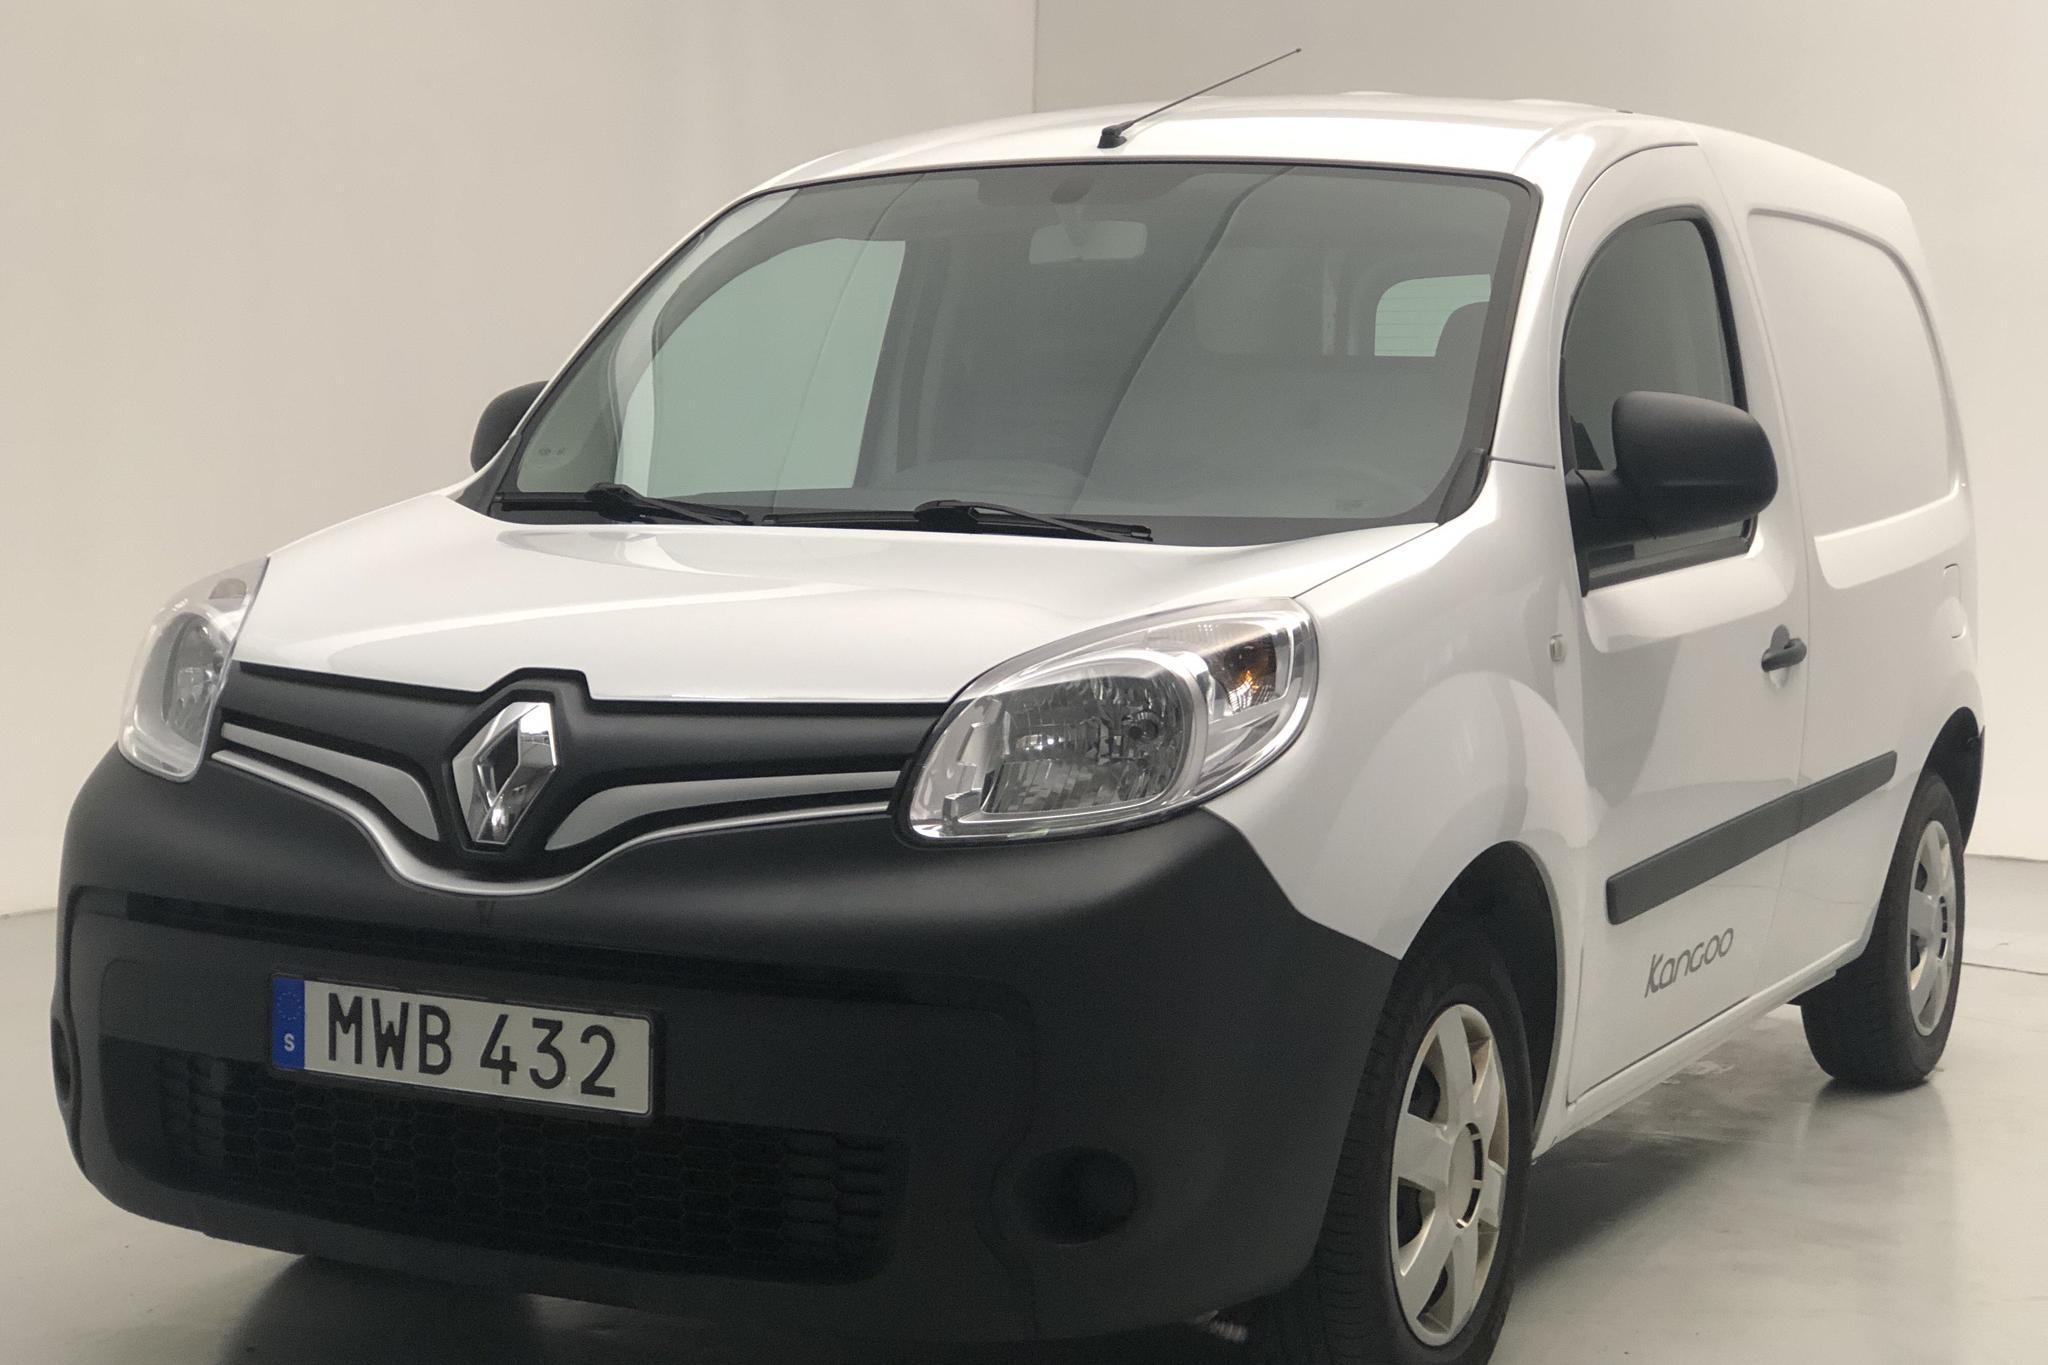 Renault Kangoo 1.5 dCi Skåp (75hk) - 6 562 mil - Manuell - vit - 2016